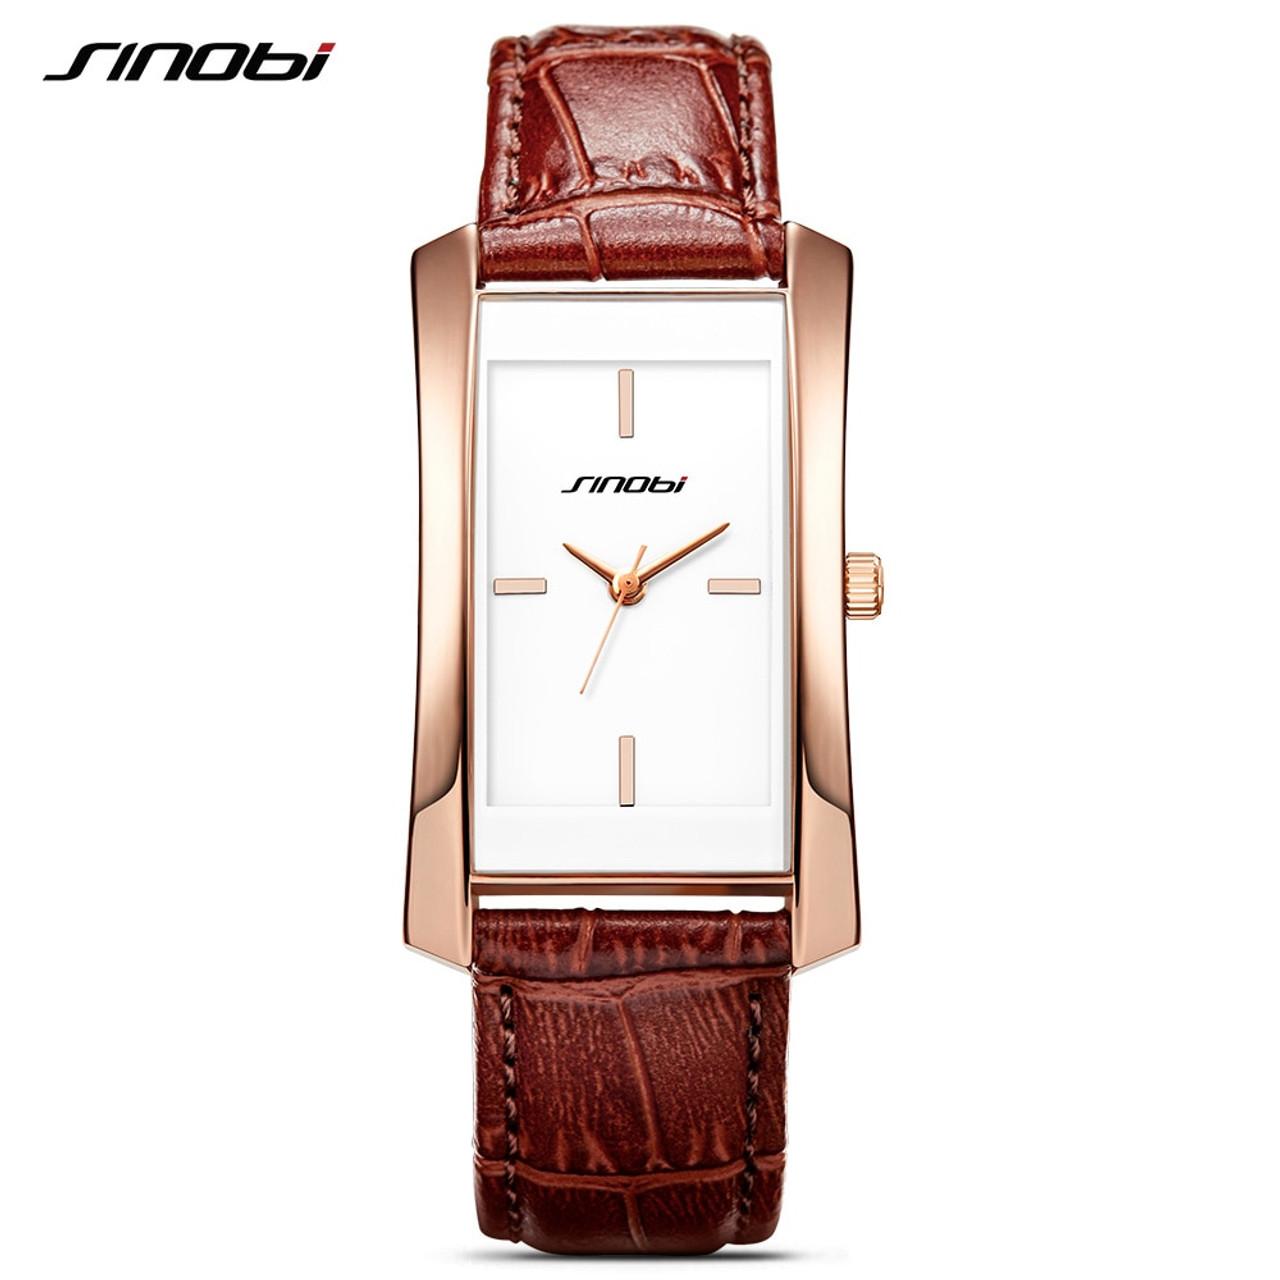 928cfabb3db3 ... Sinobi Couple Watches Wedding Gift Noble Rose Gold Rectangle Wristwatch  Brown Strap Men Women Analog Quartz ...